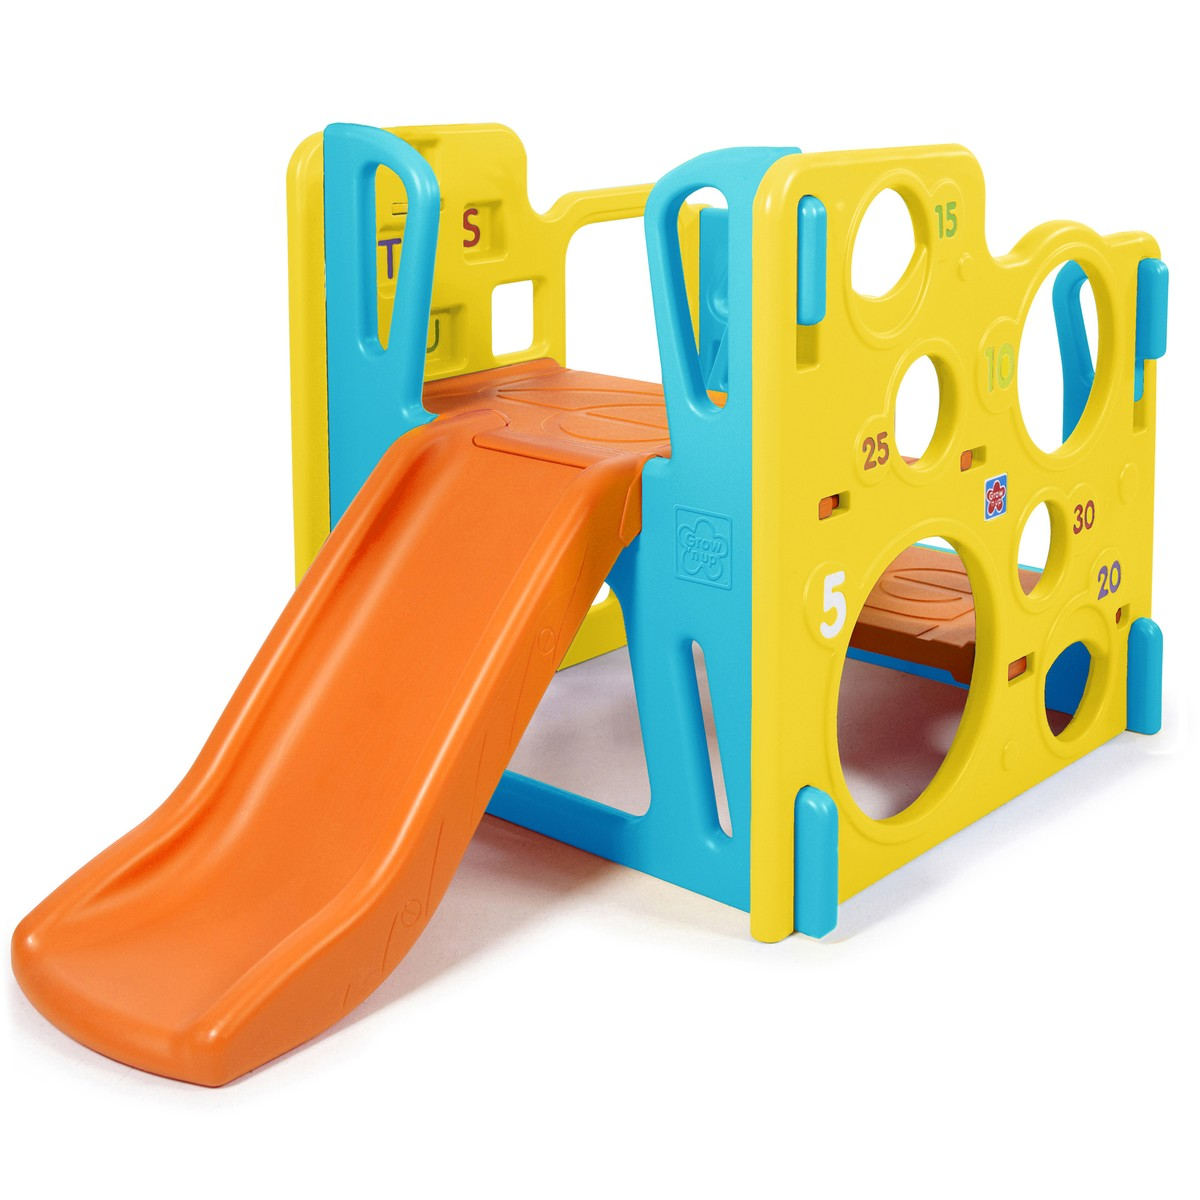 Toys Grow n Up Climb n Explore Play Gym Slide Playground